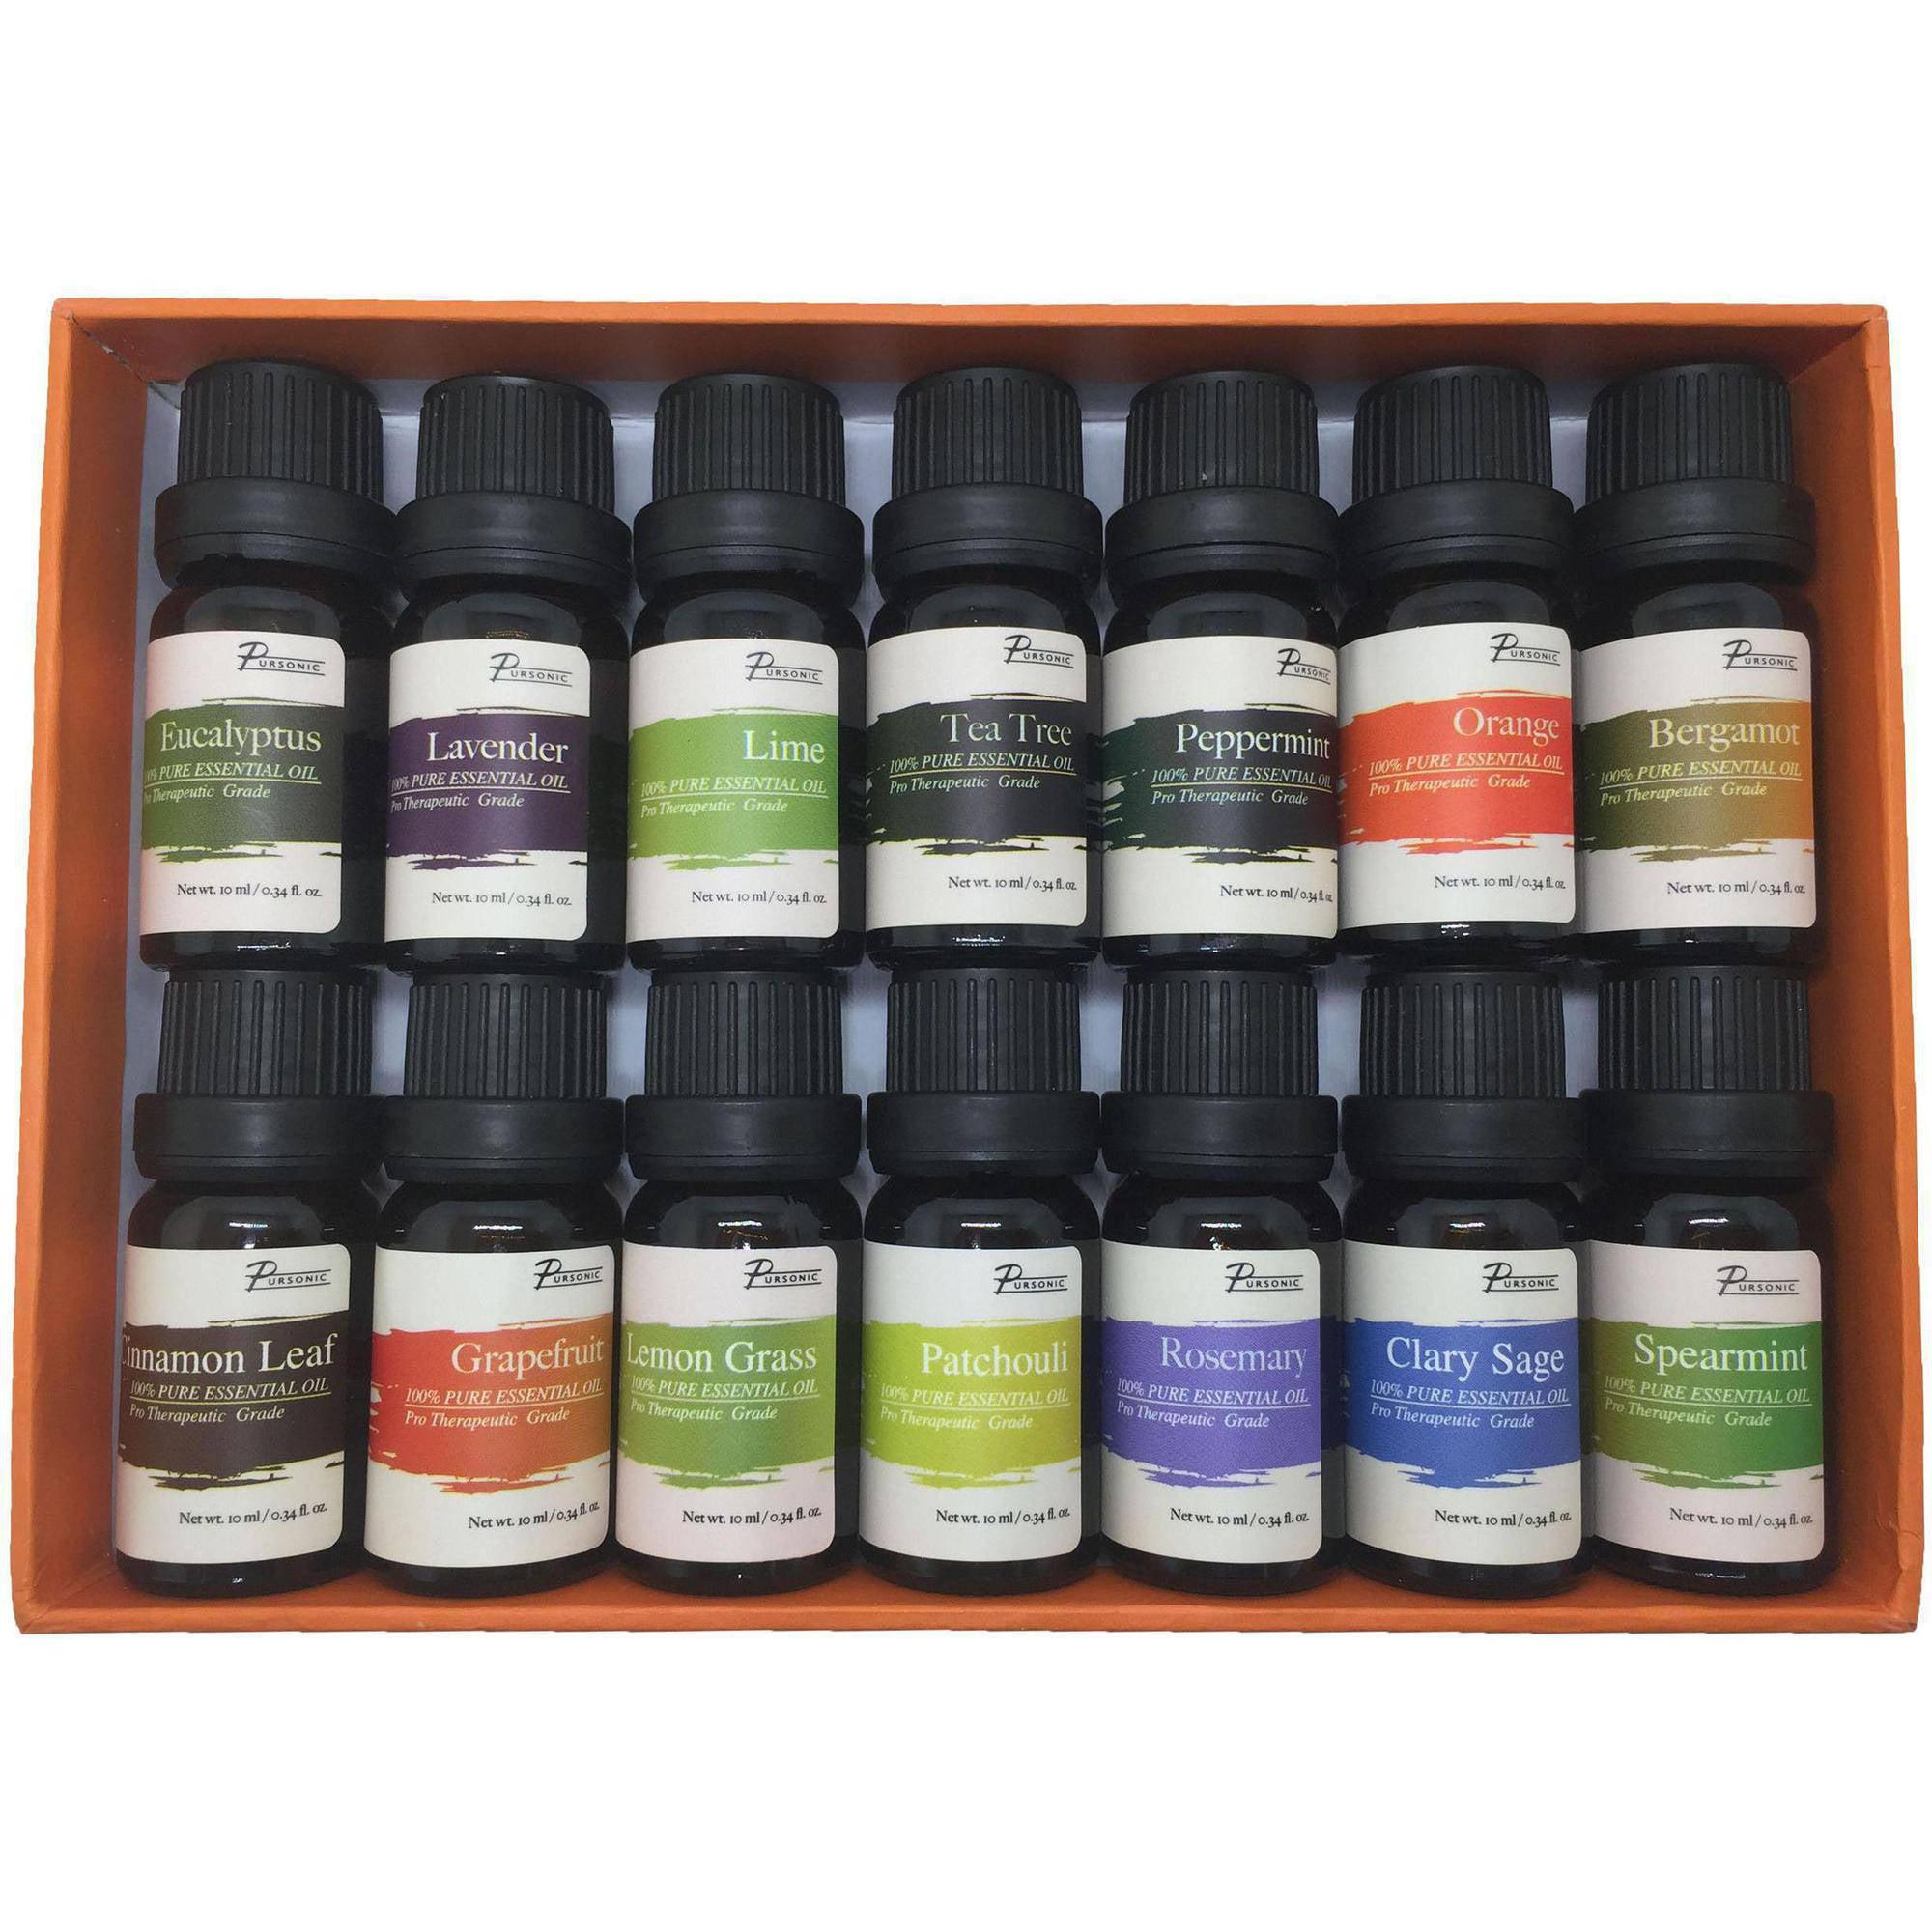 delightful Lemon Grass Walmart Part - 5: Pursonic Pure Essential Aroma Oils, 14-Pack - Walmart.com